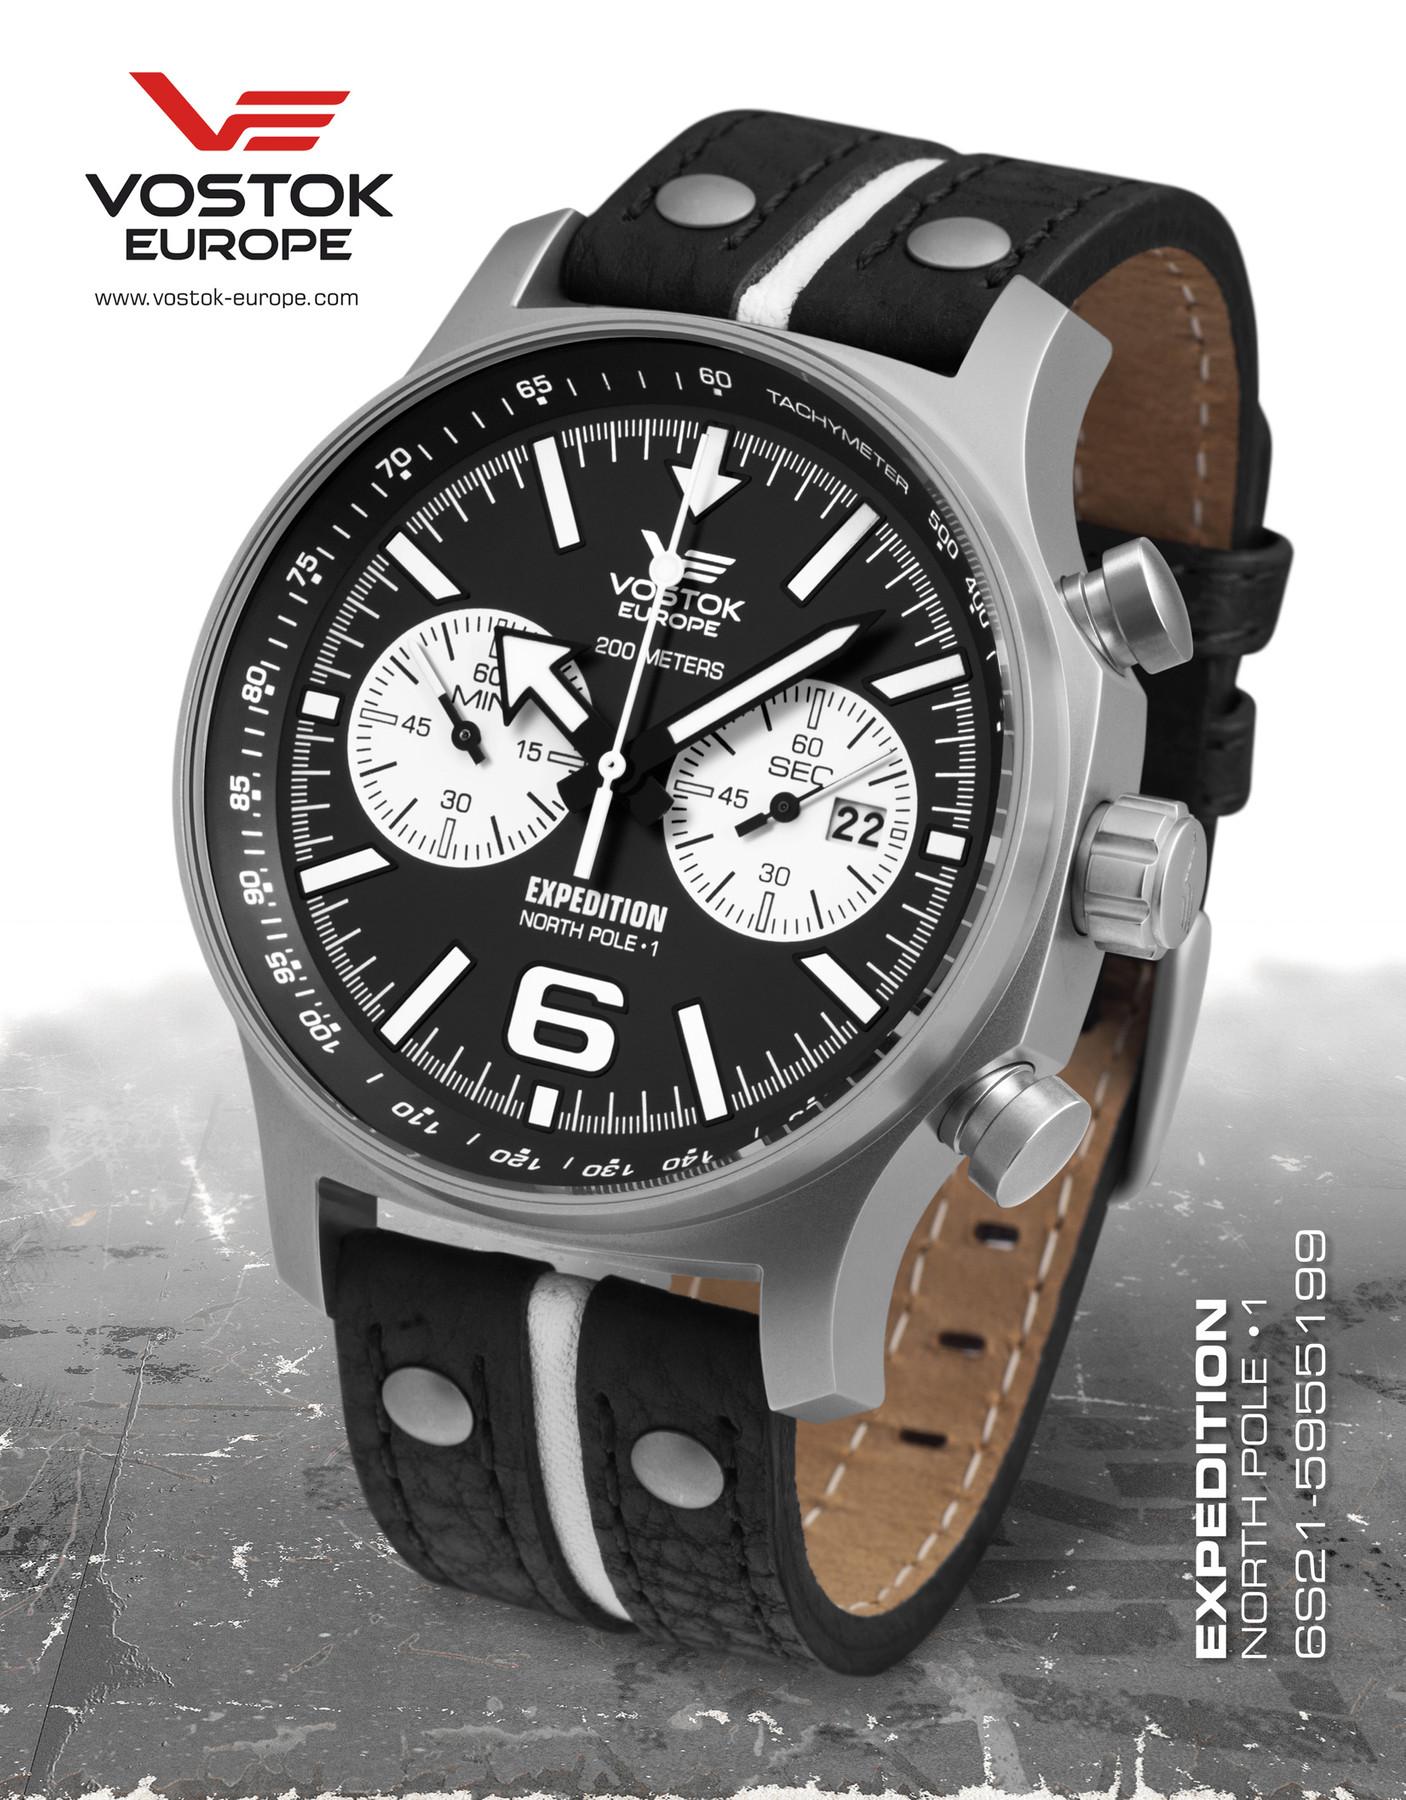 Bild 2 Vostok Europe Expedition Northpole 1 6S21-5955199 Edelstahl Chronograph